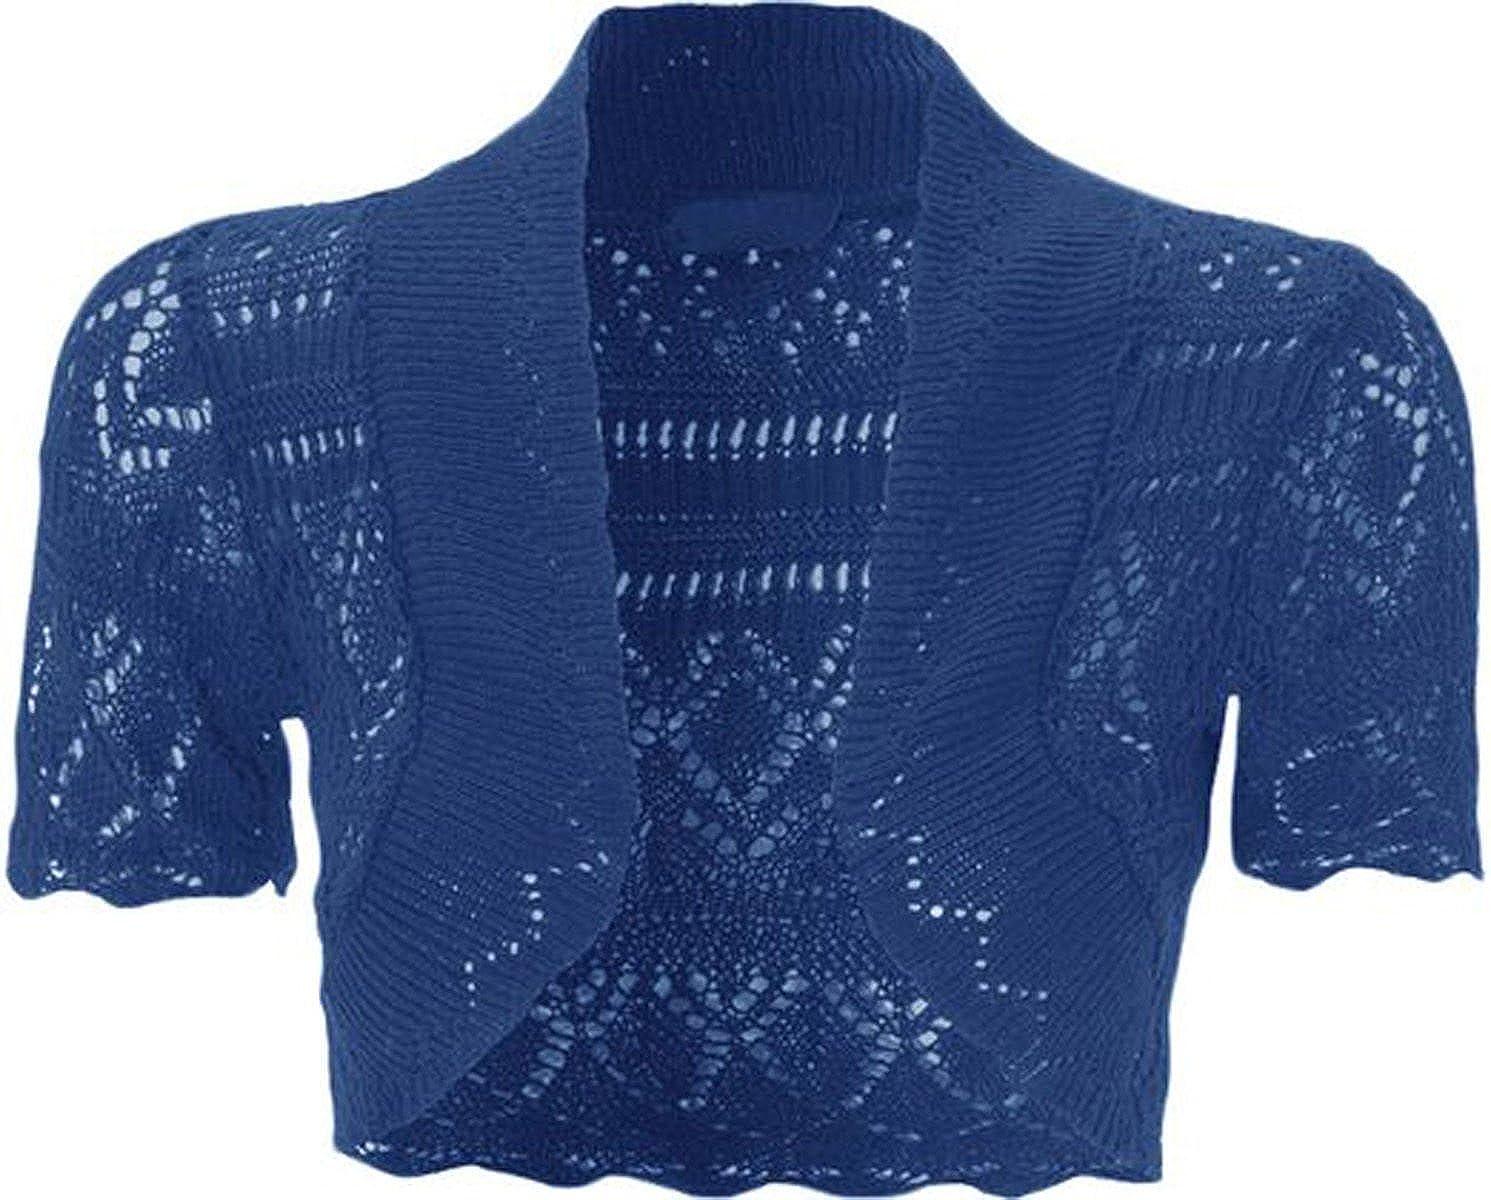 2-13 Years ZEE FASHION New Kids Girls Bolero Knitted Cardigan Shrugs Top Age